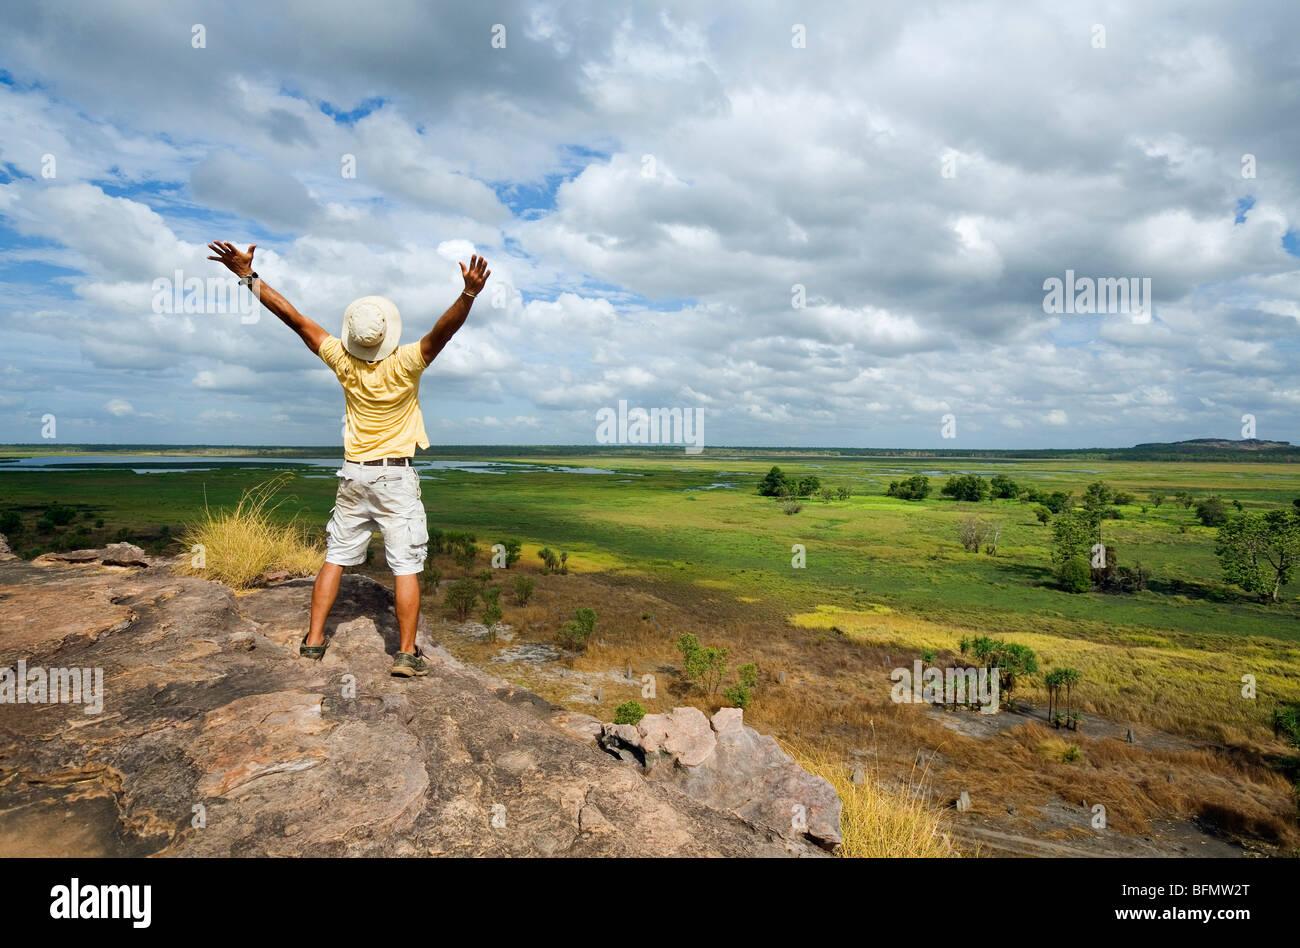 Australia, Northern Territory, Kakadu National Park. A tourist stands atop the Nadab escarpment at Ubirr. (MR) (PR) Stock Photo